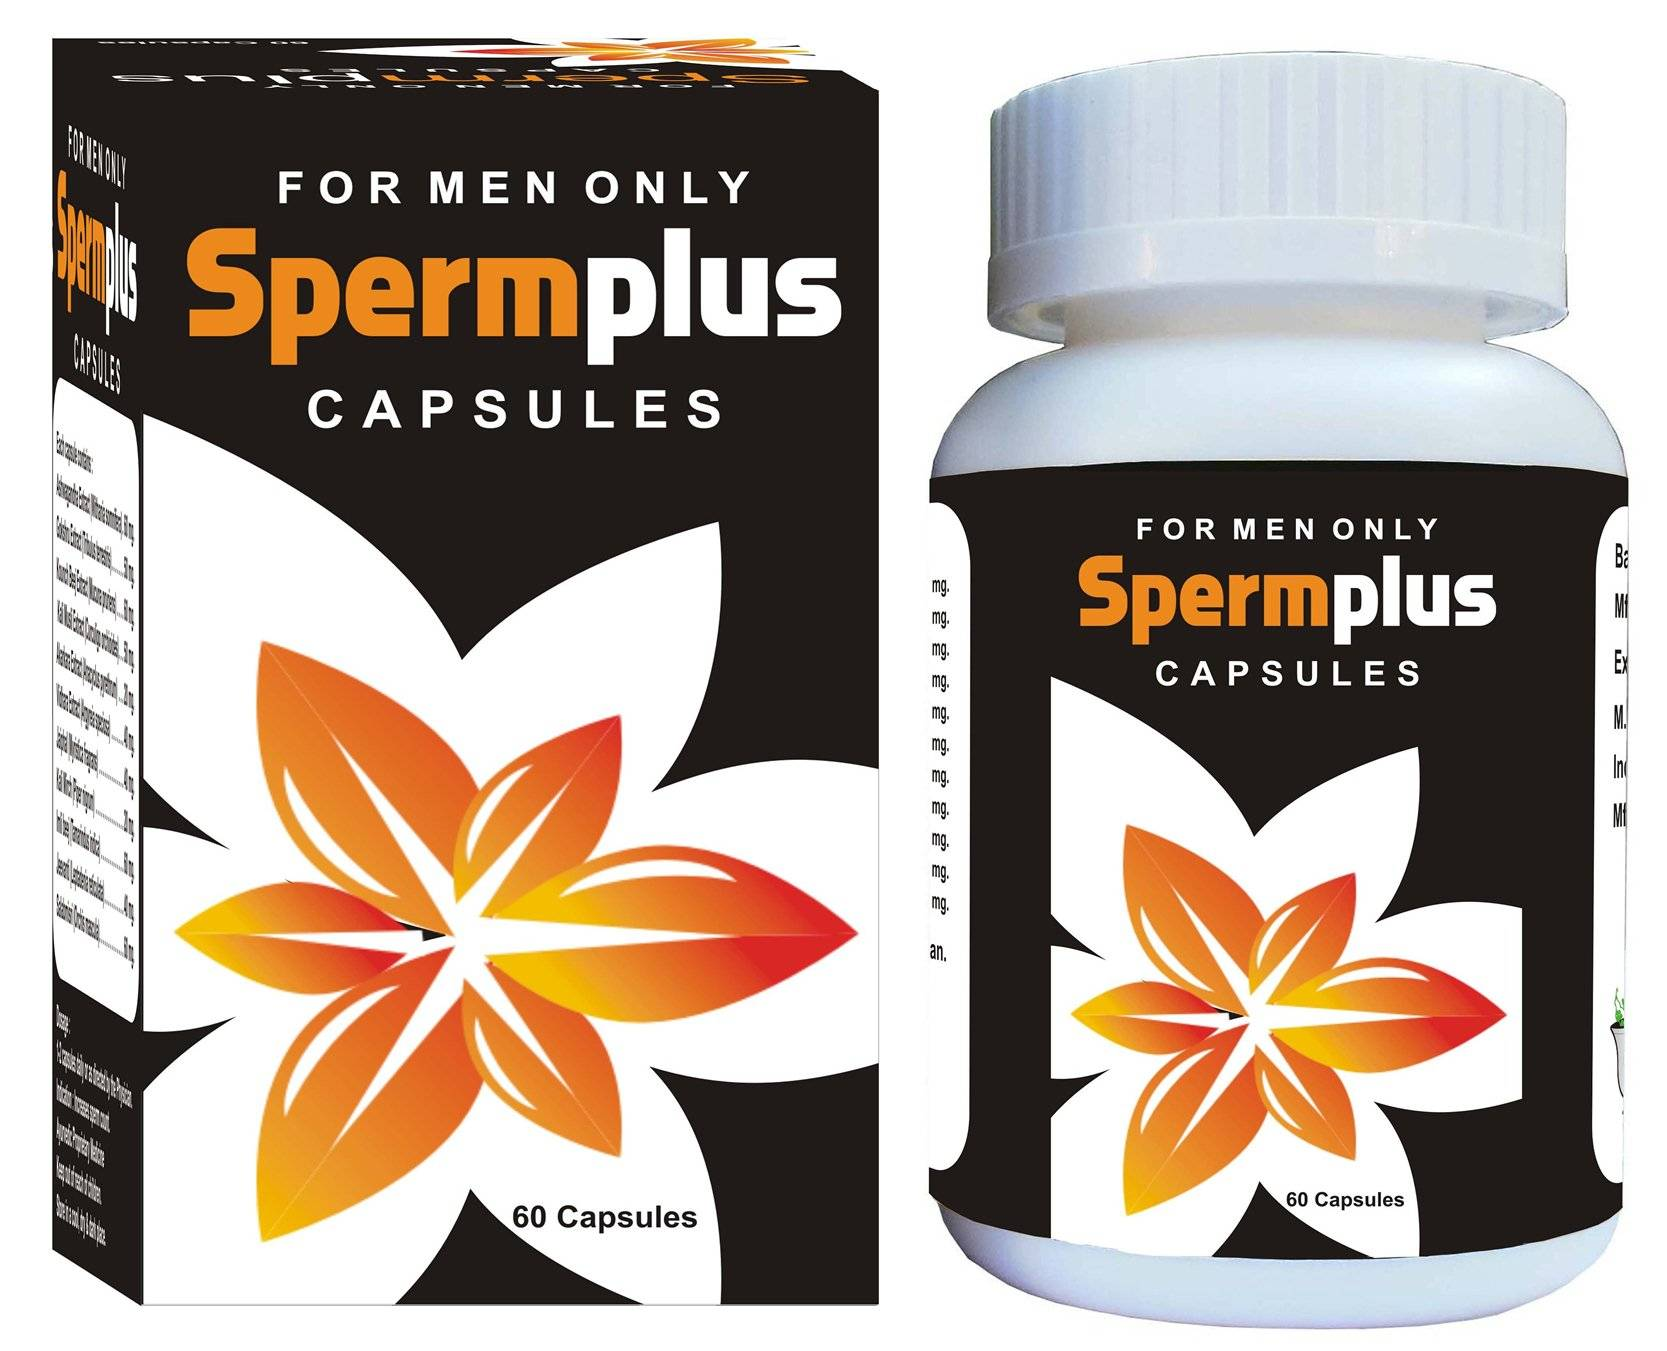 Spermplus-For Low Sperm Count